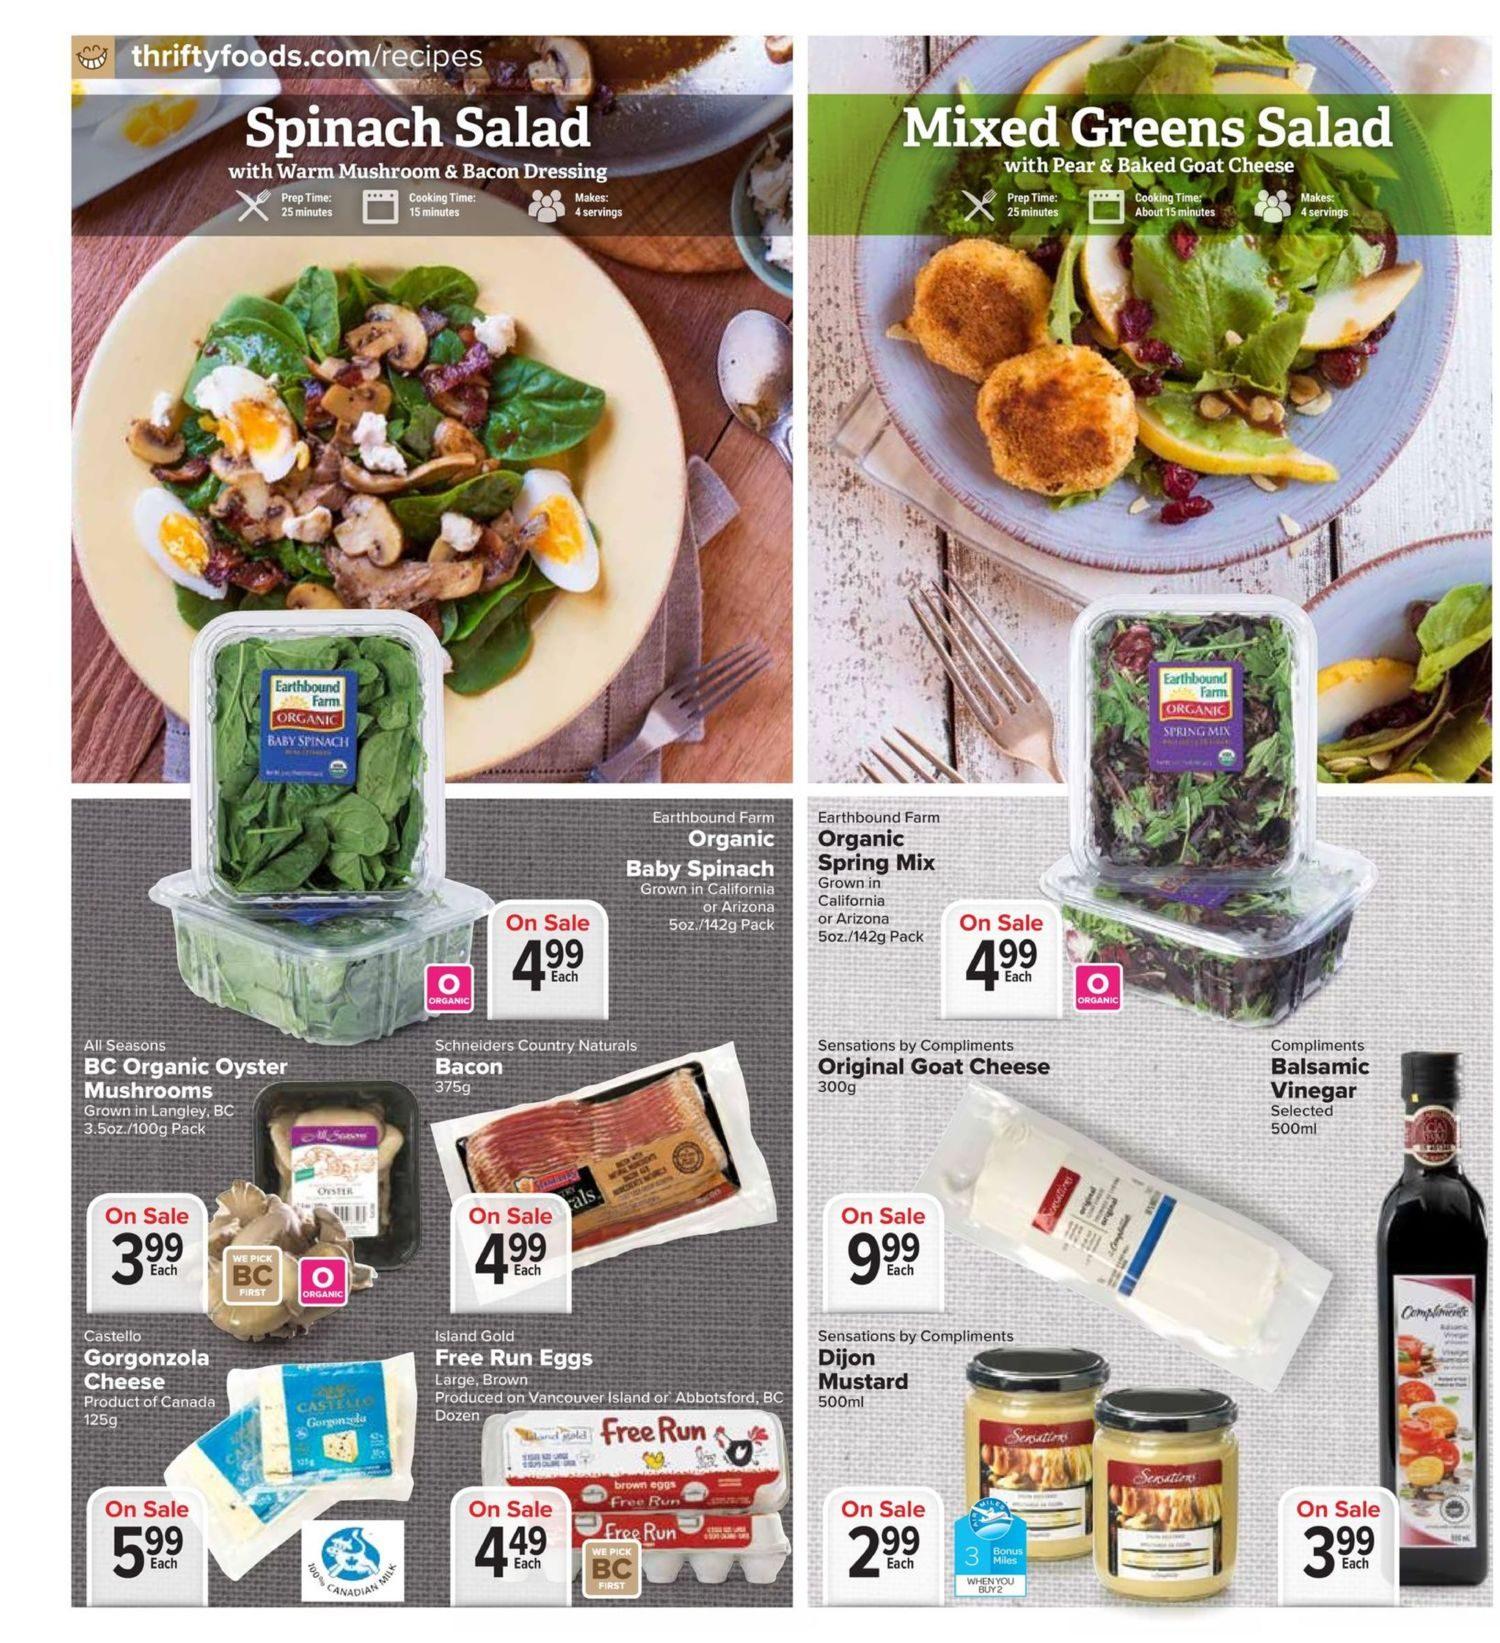 Thrifty Foods Weekly Flyer Specials Jan 11 17 Greenfields Yogurt Mango 125g